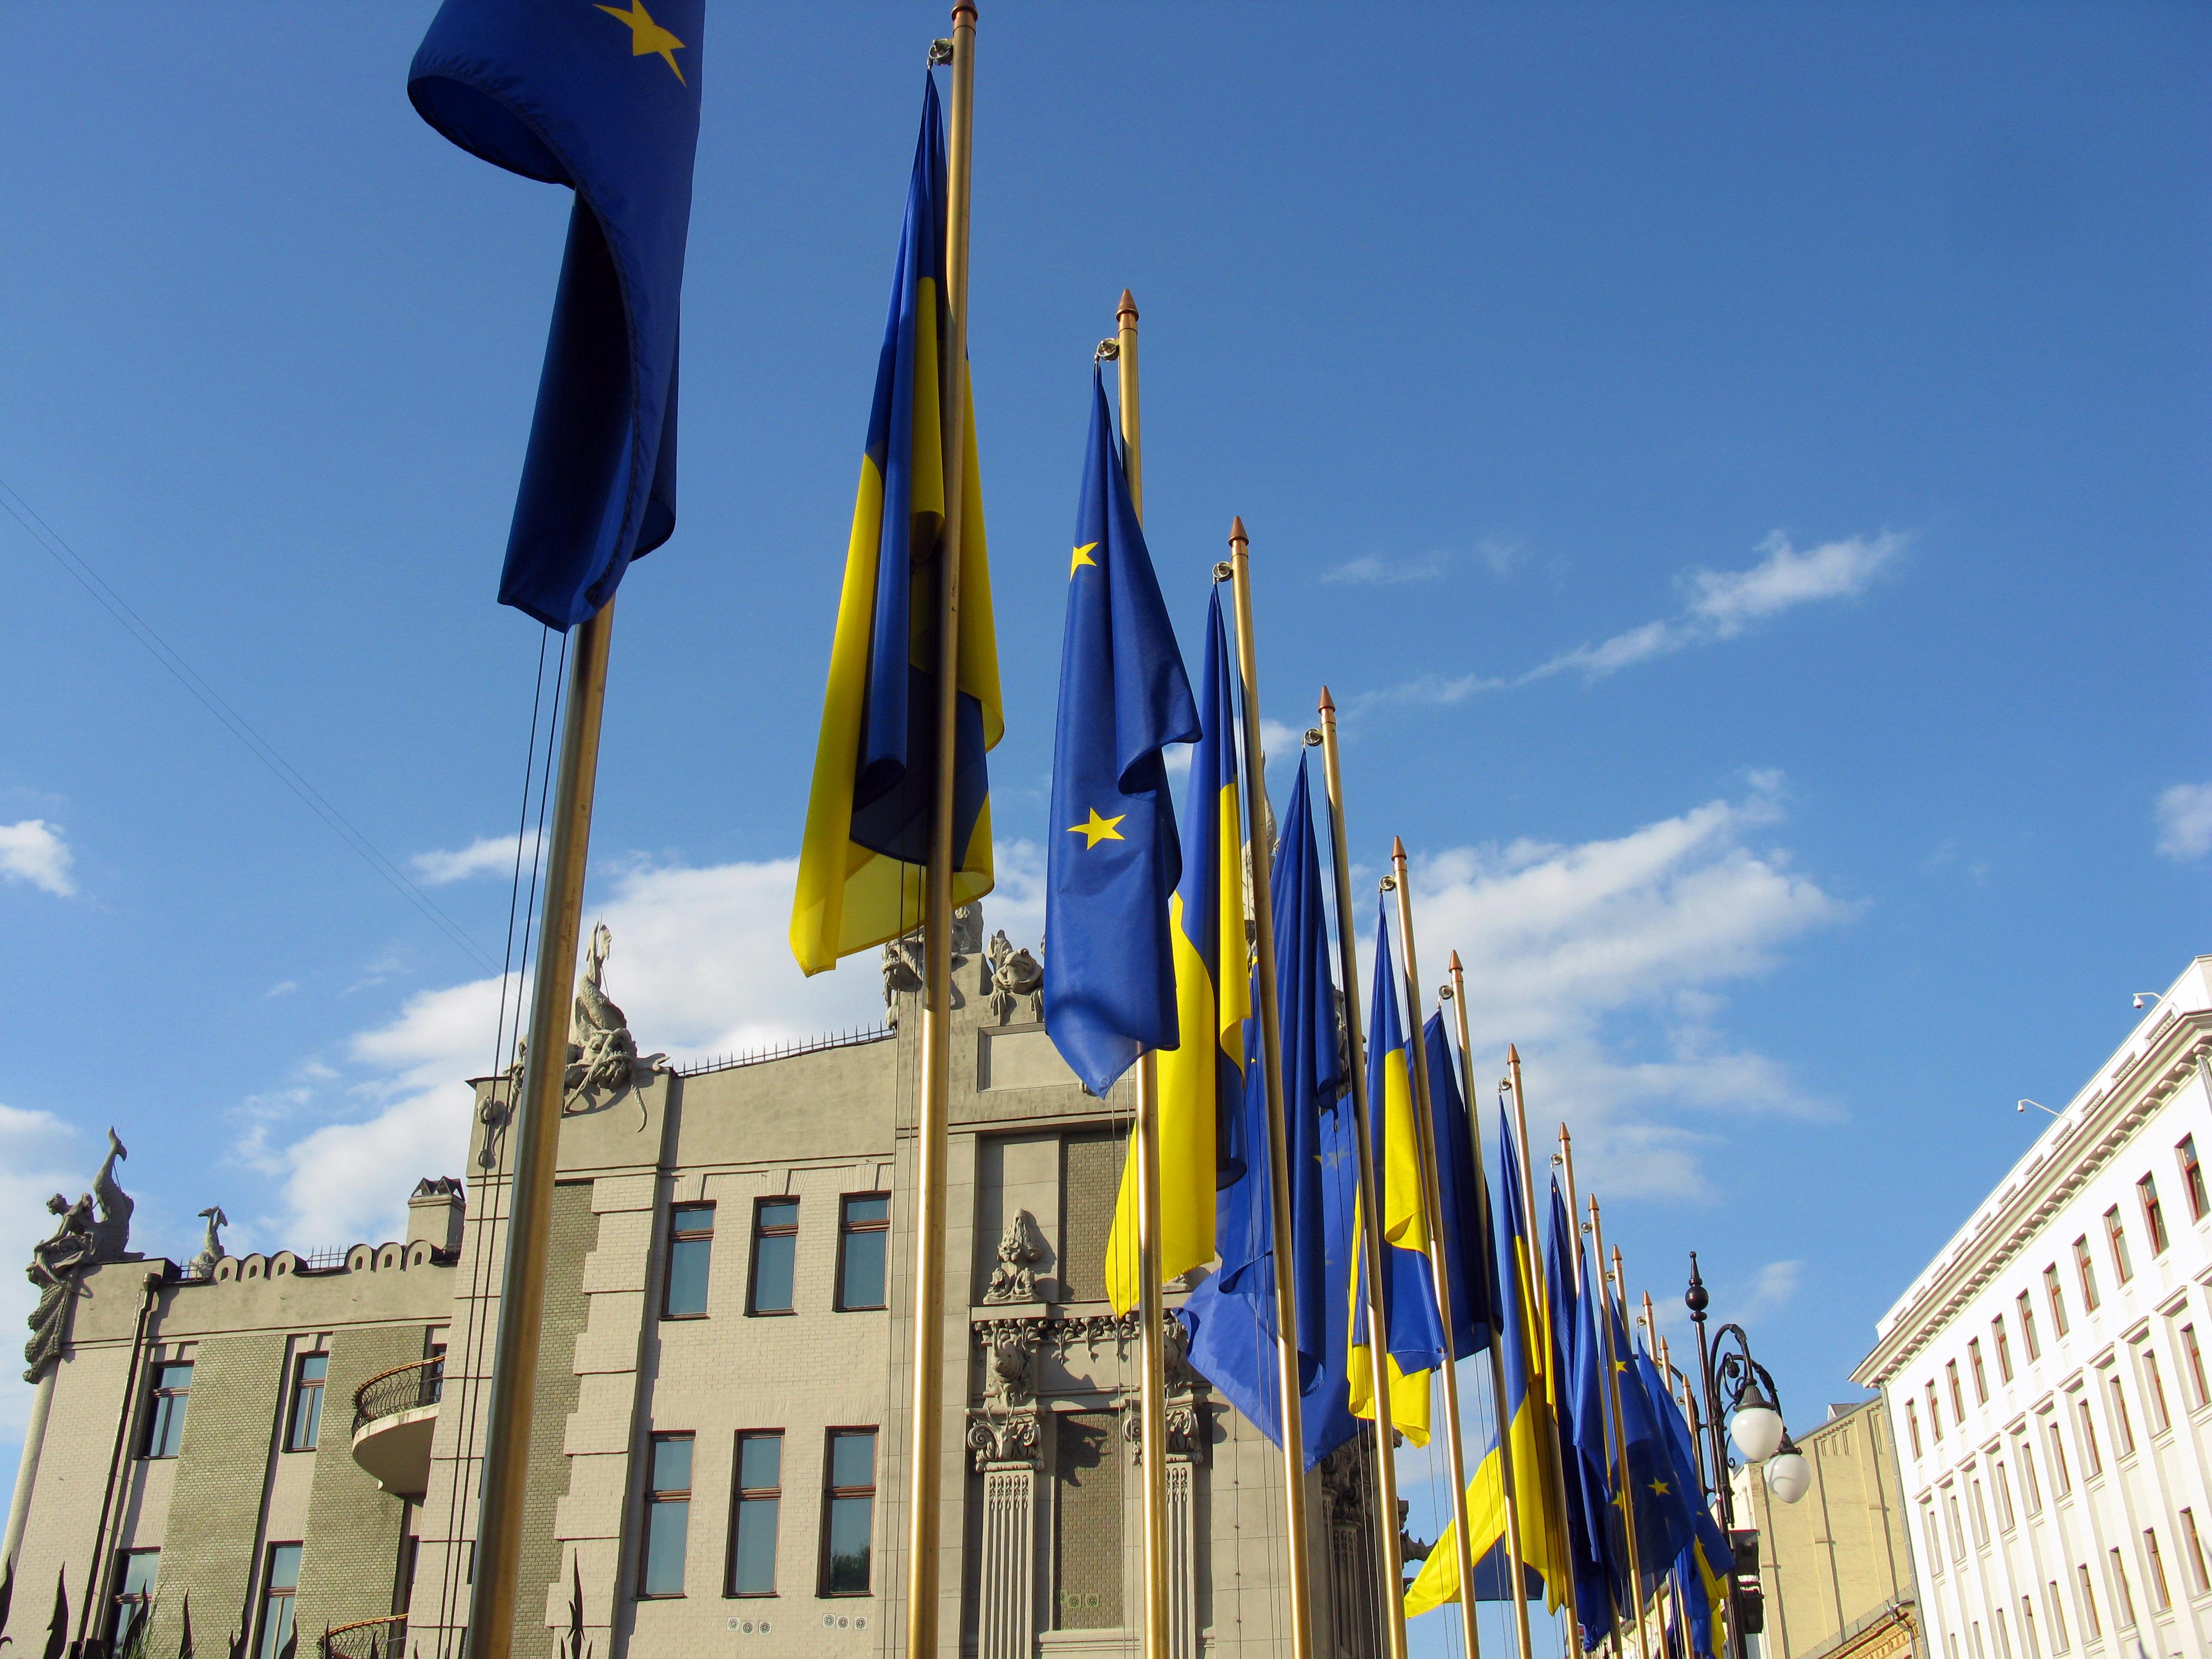 Trust and unity between Ukraine and international community